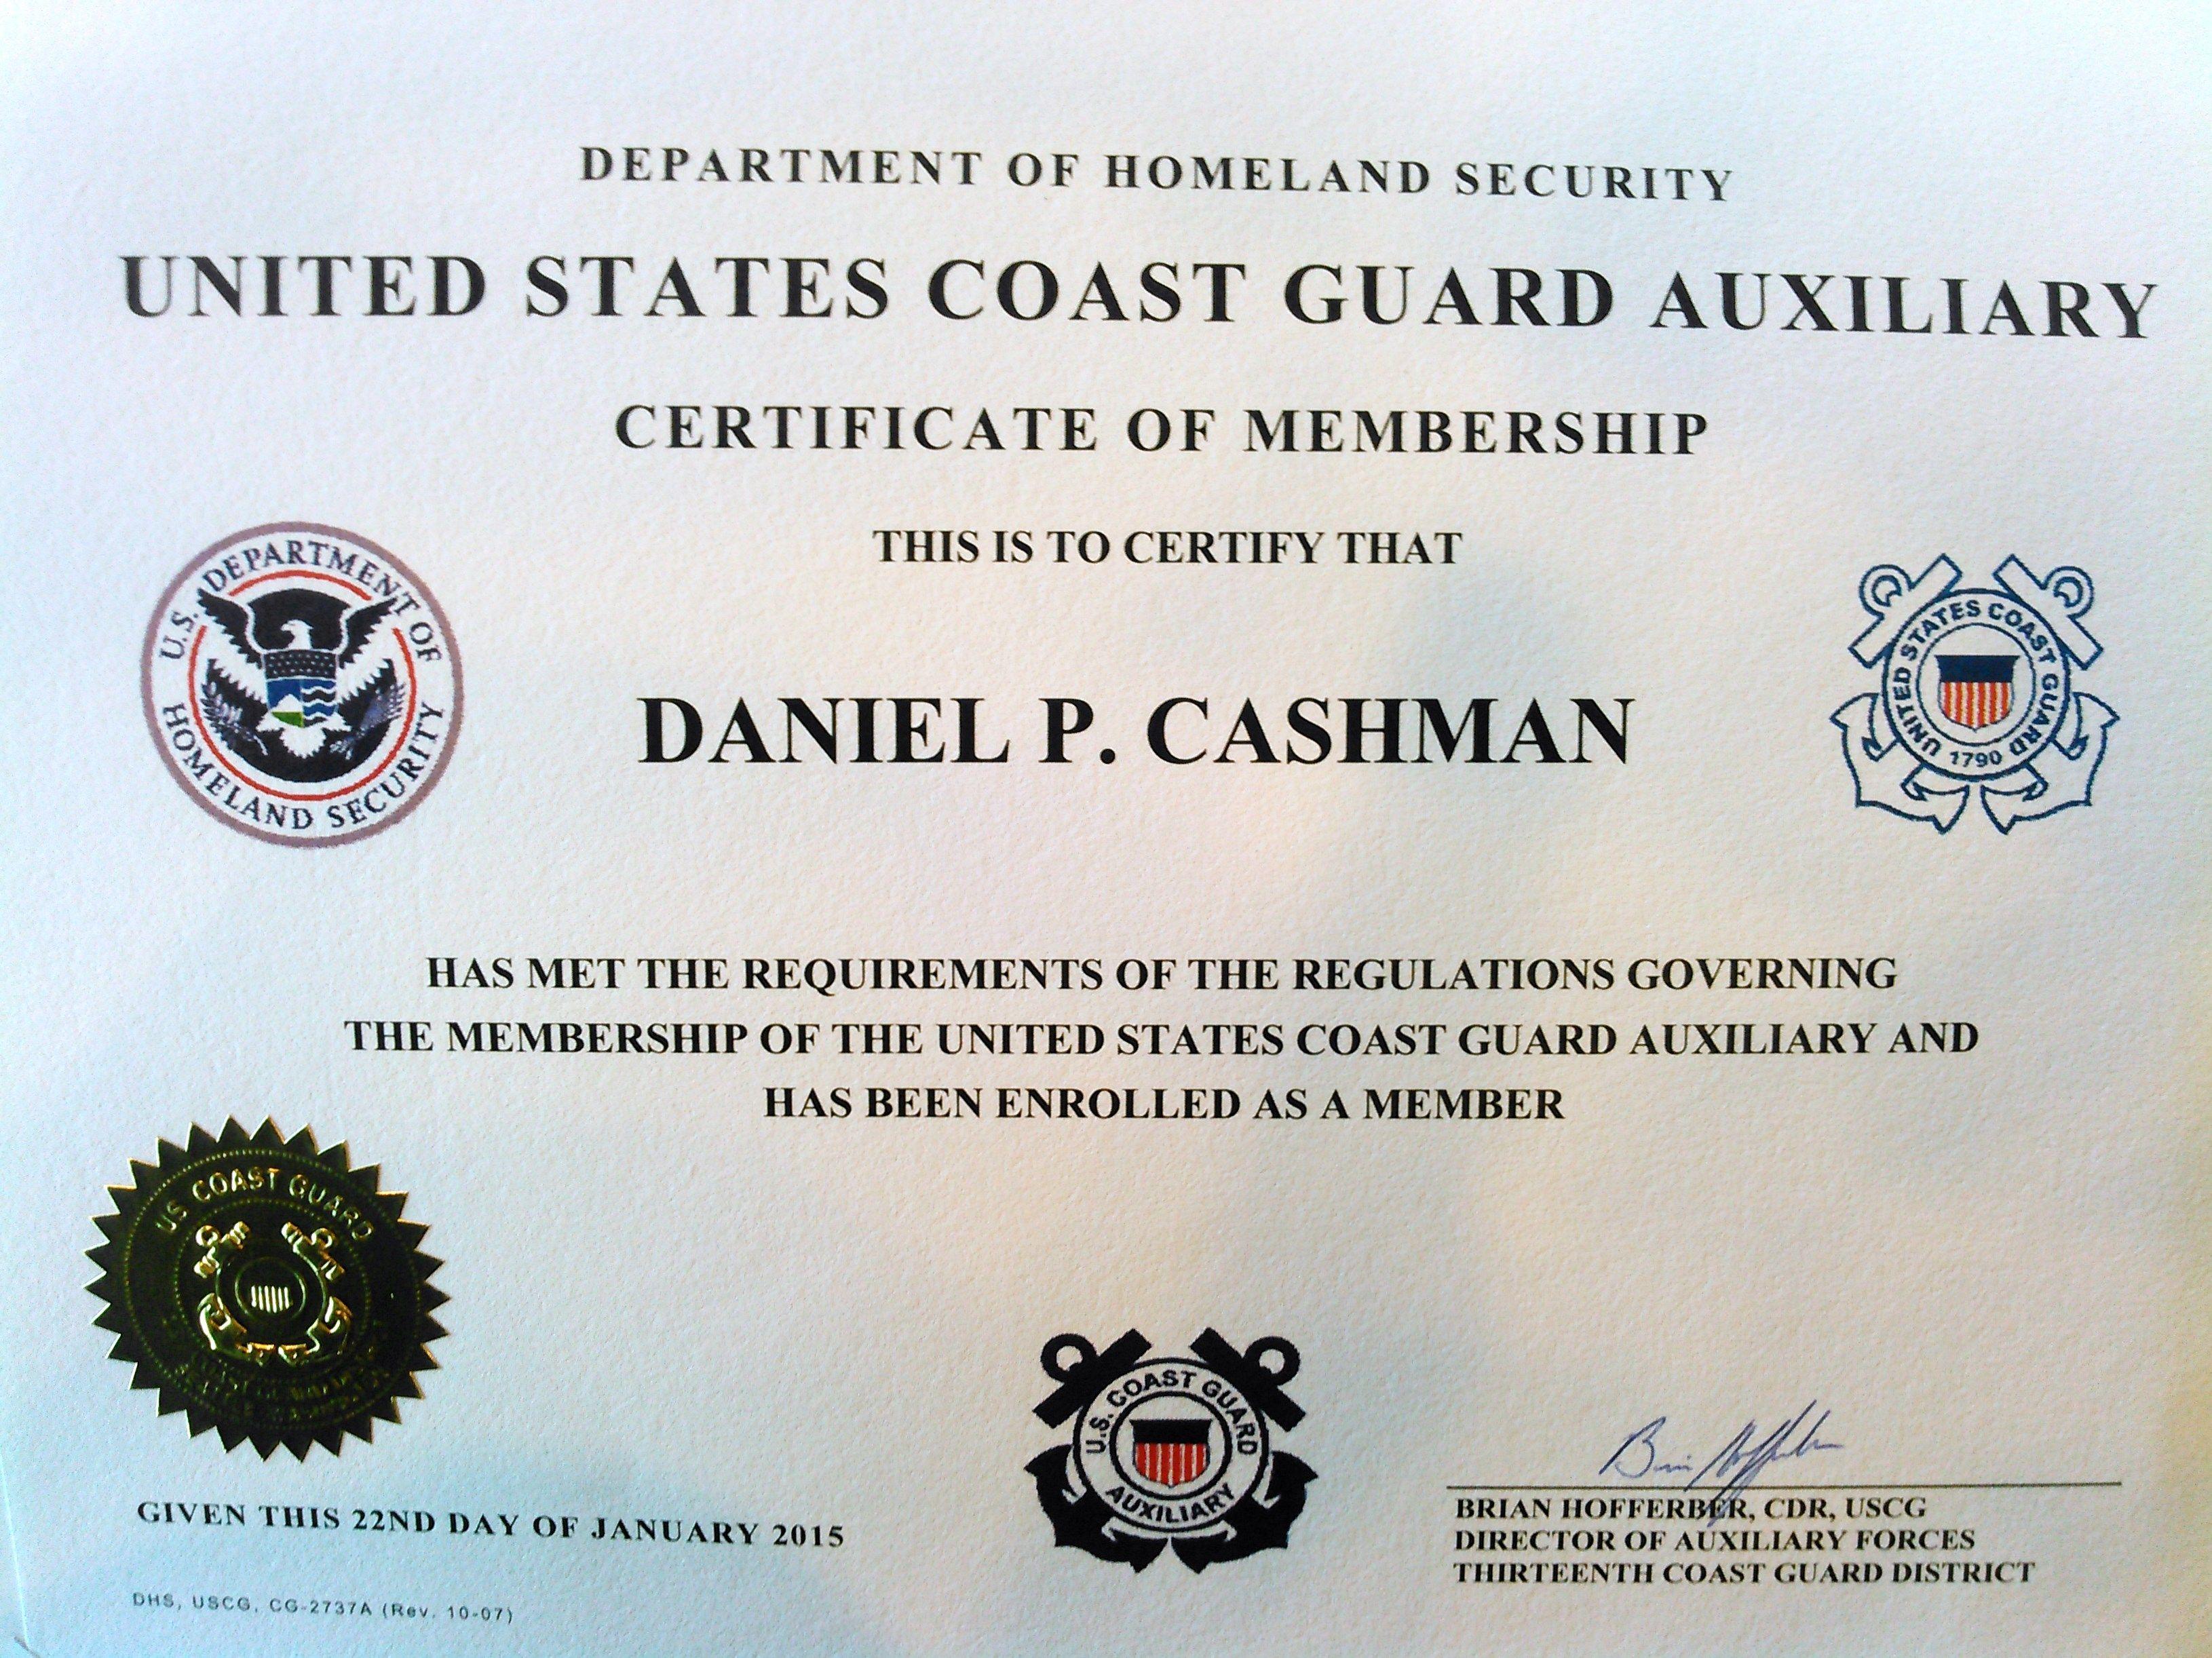 Coast Guard Auxiliary Certificate Of Membership 22 Jan 2015 Cg Aux